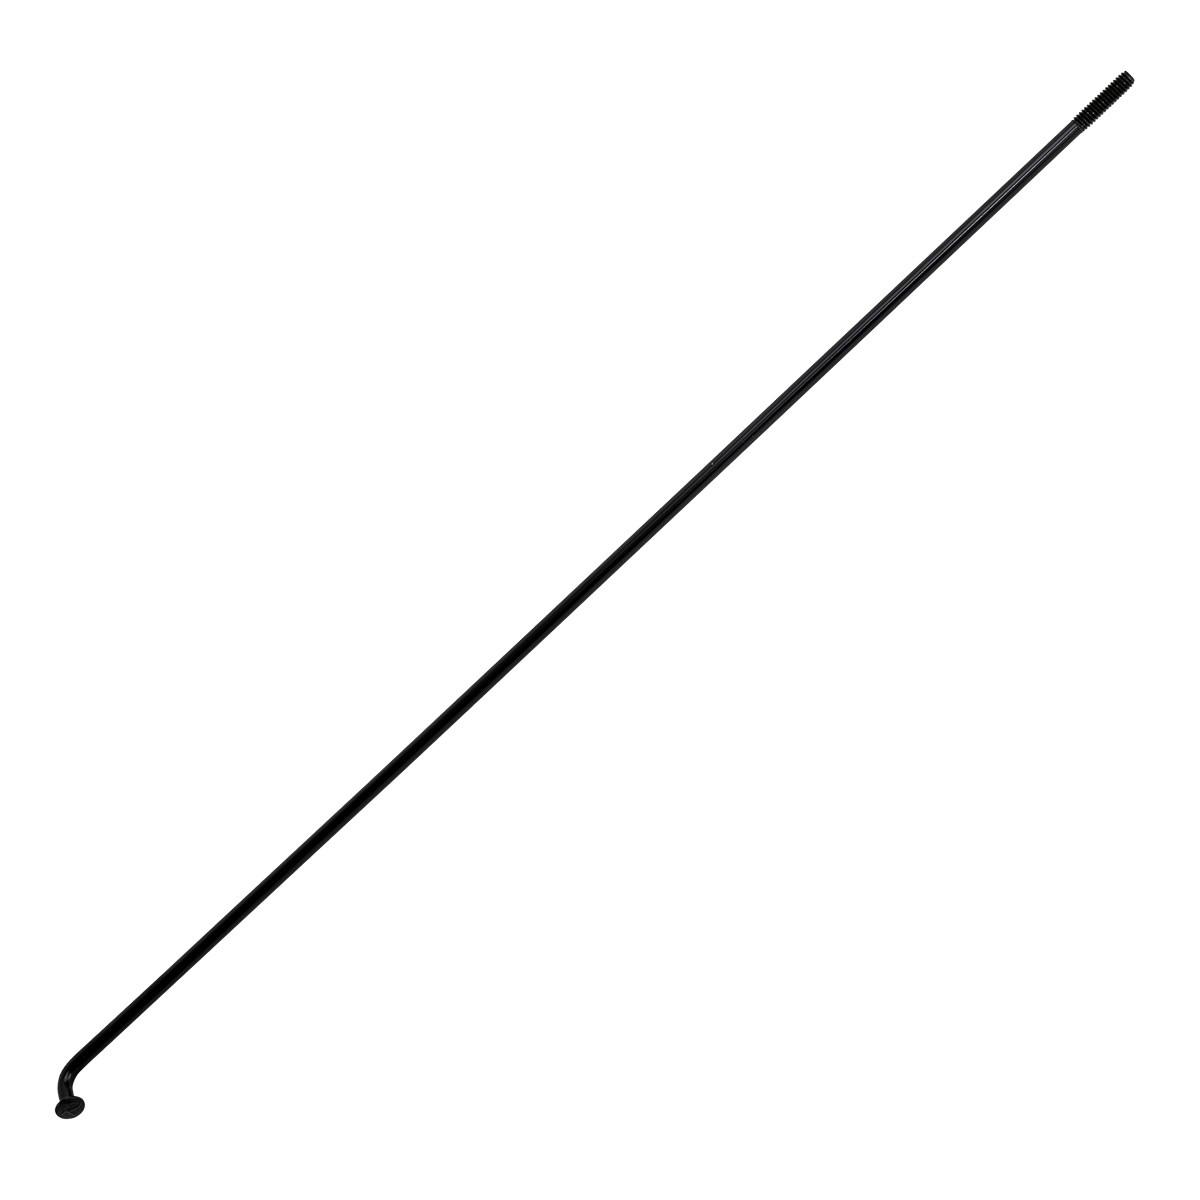 EXCESS STEEL SPOKES BLACK (UNIT)